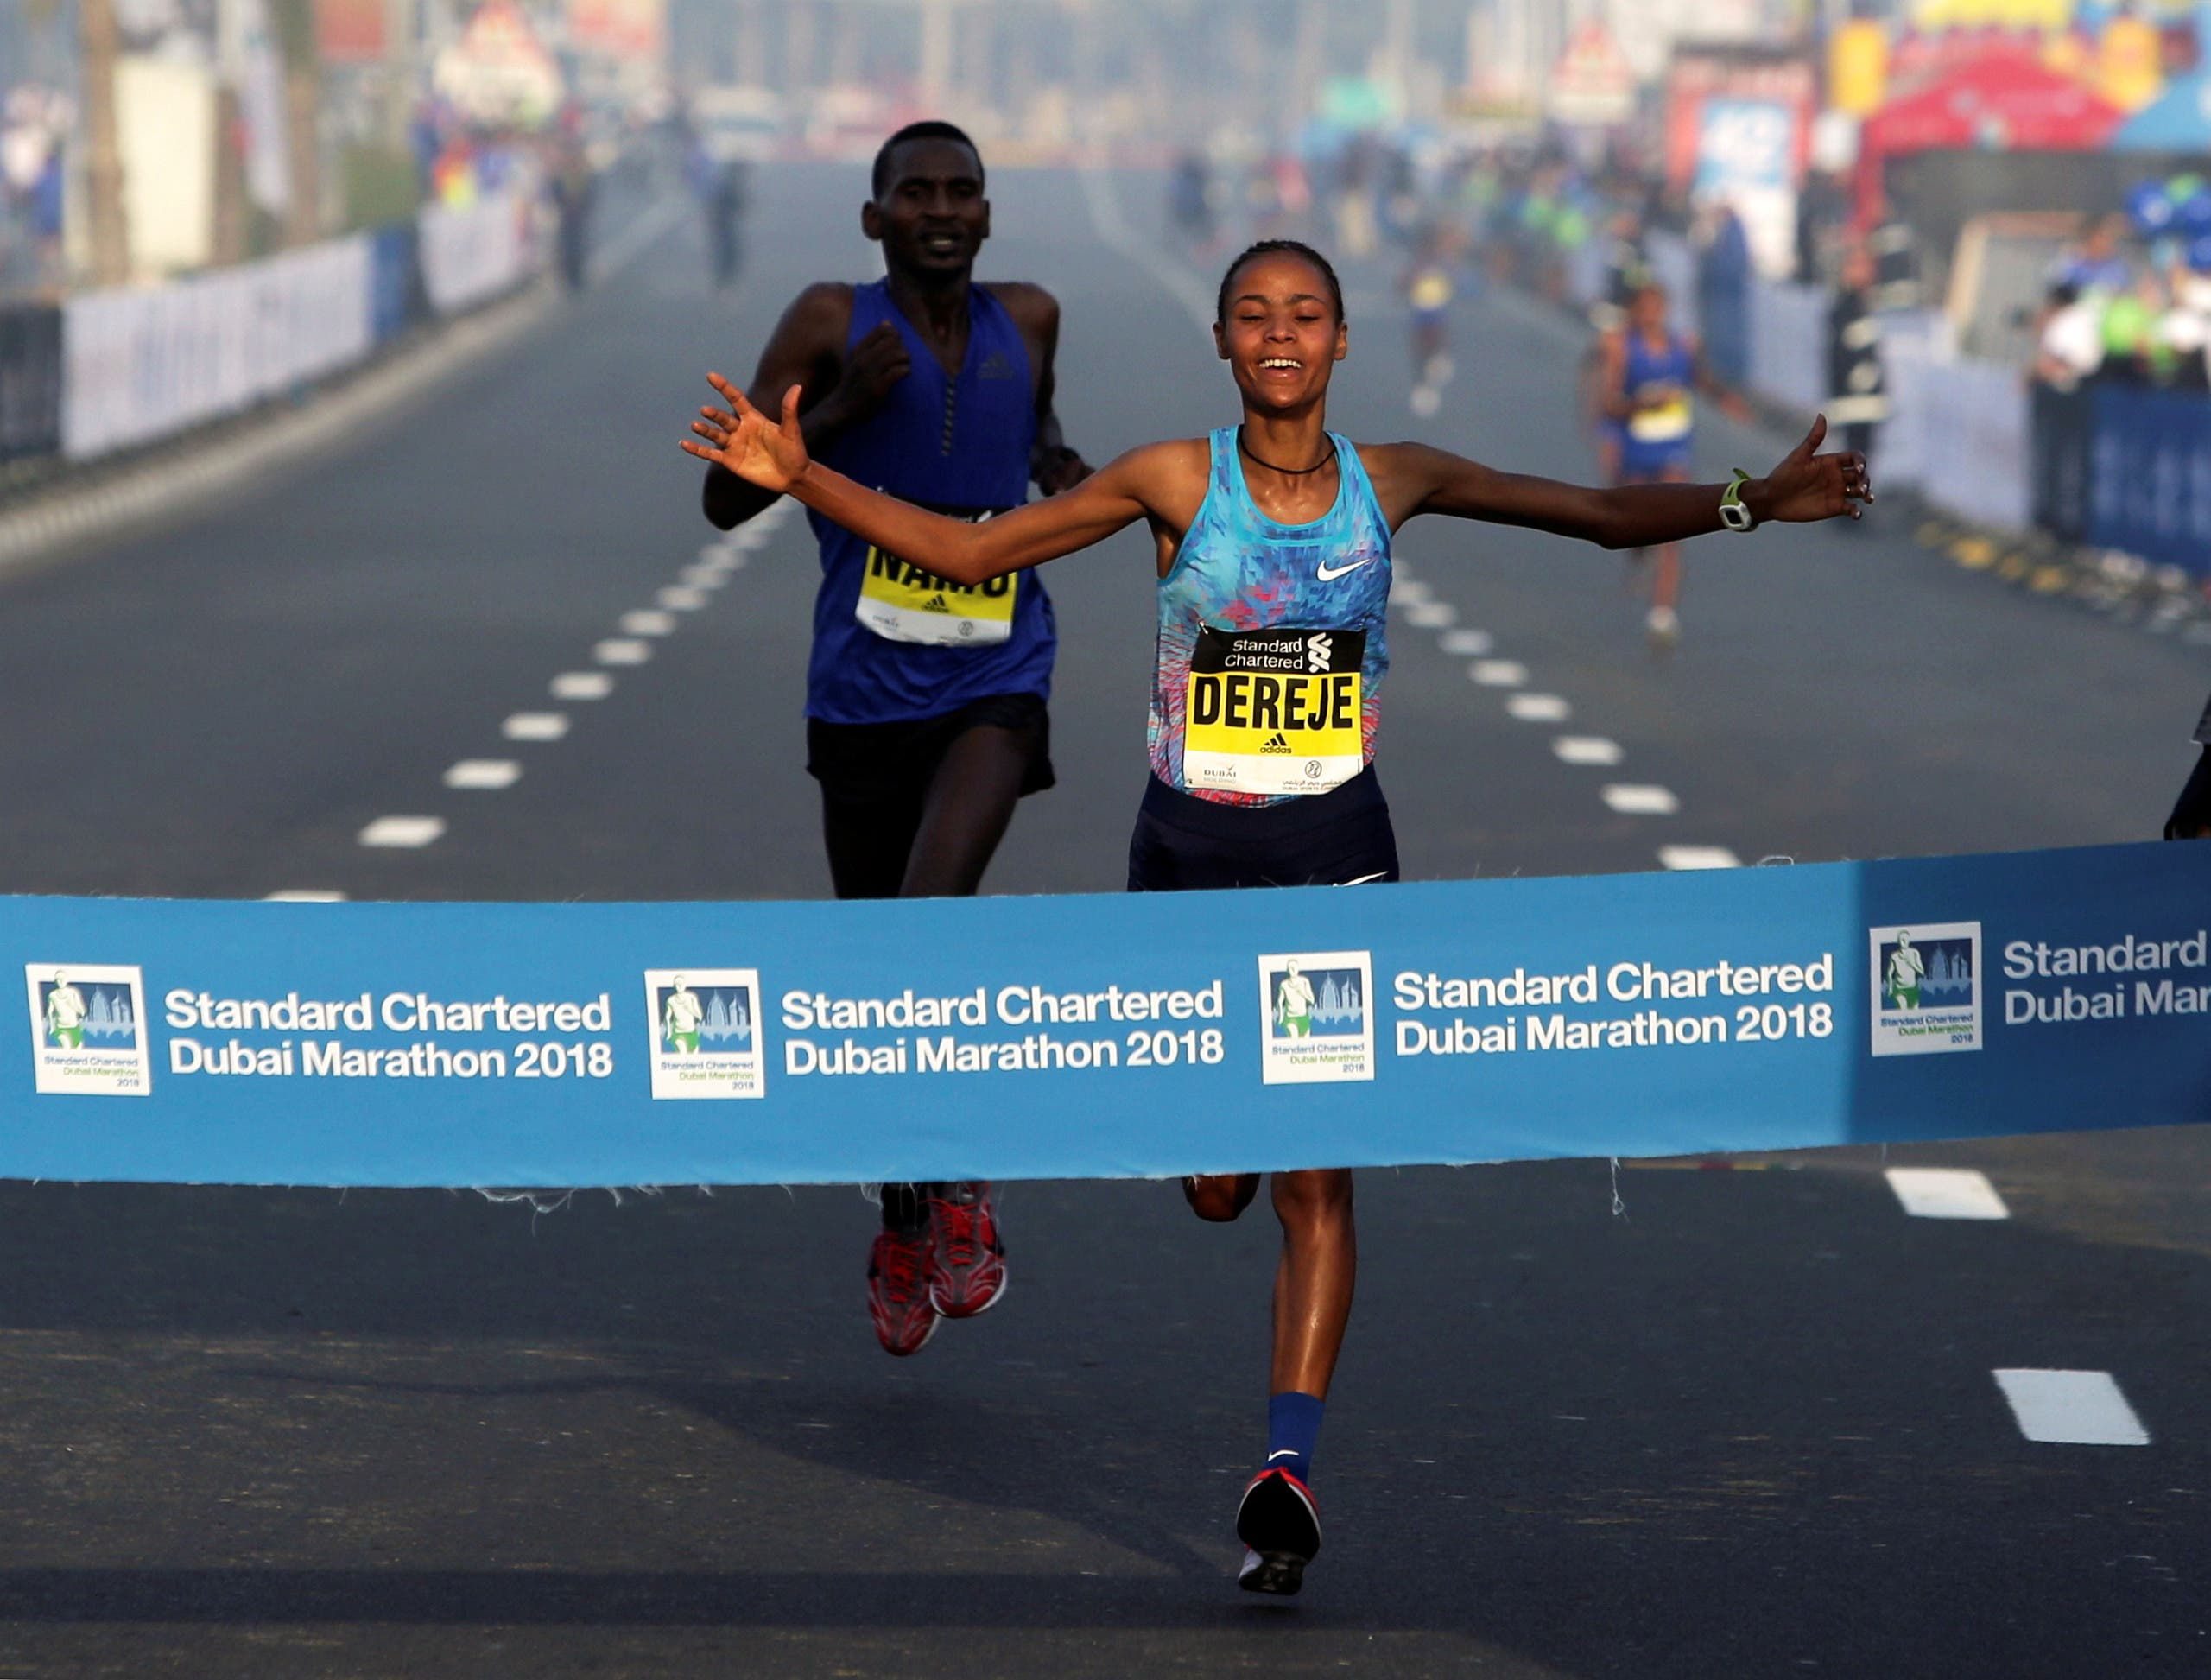 Roza Dereje Bekele of Ethiopia crosses the finish line of the Dubai Marathon, in Dubai, UAE January 26, 2018. REUTERS